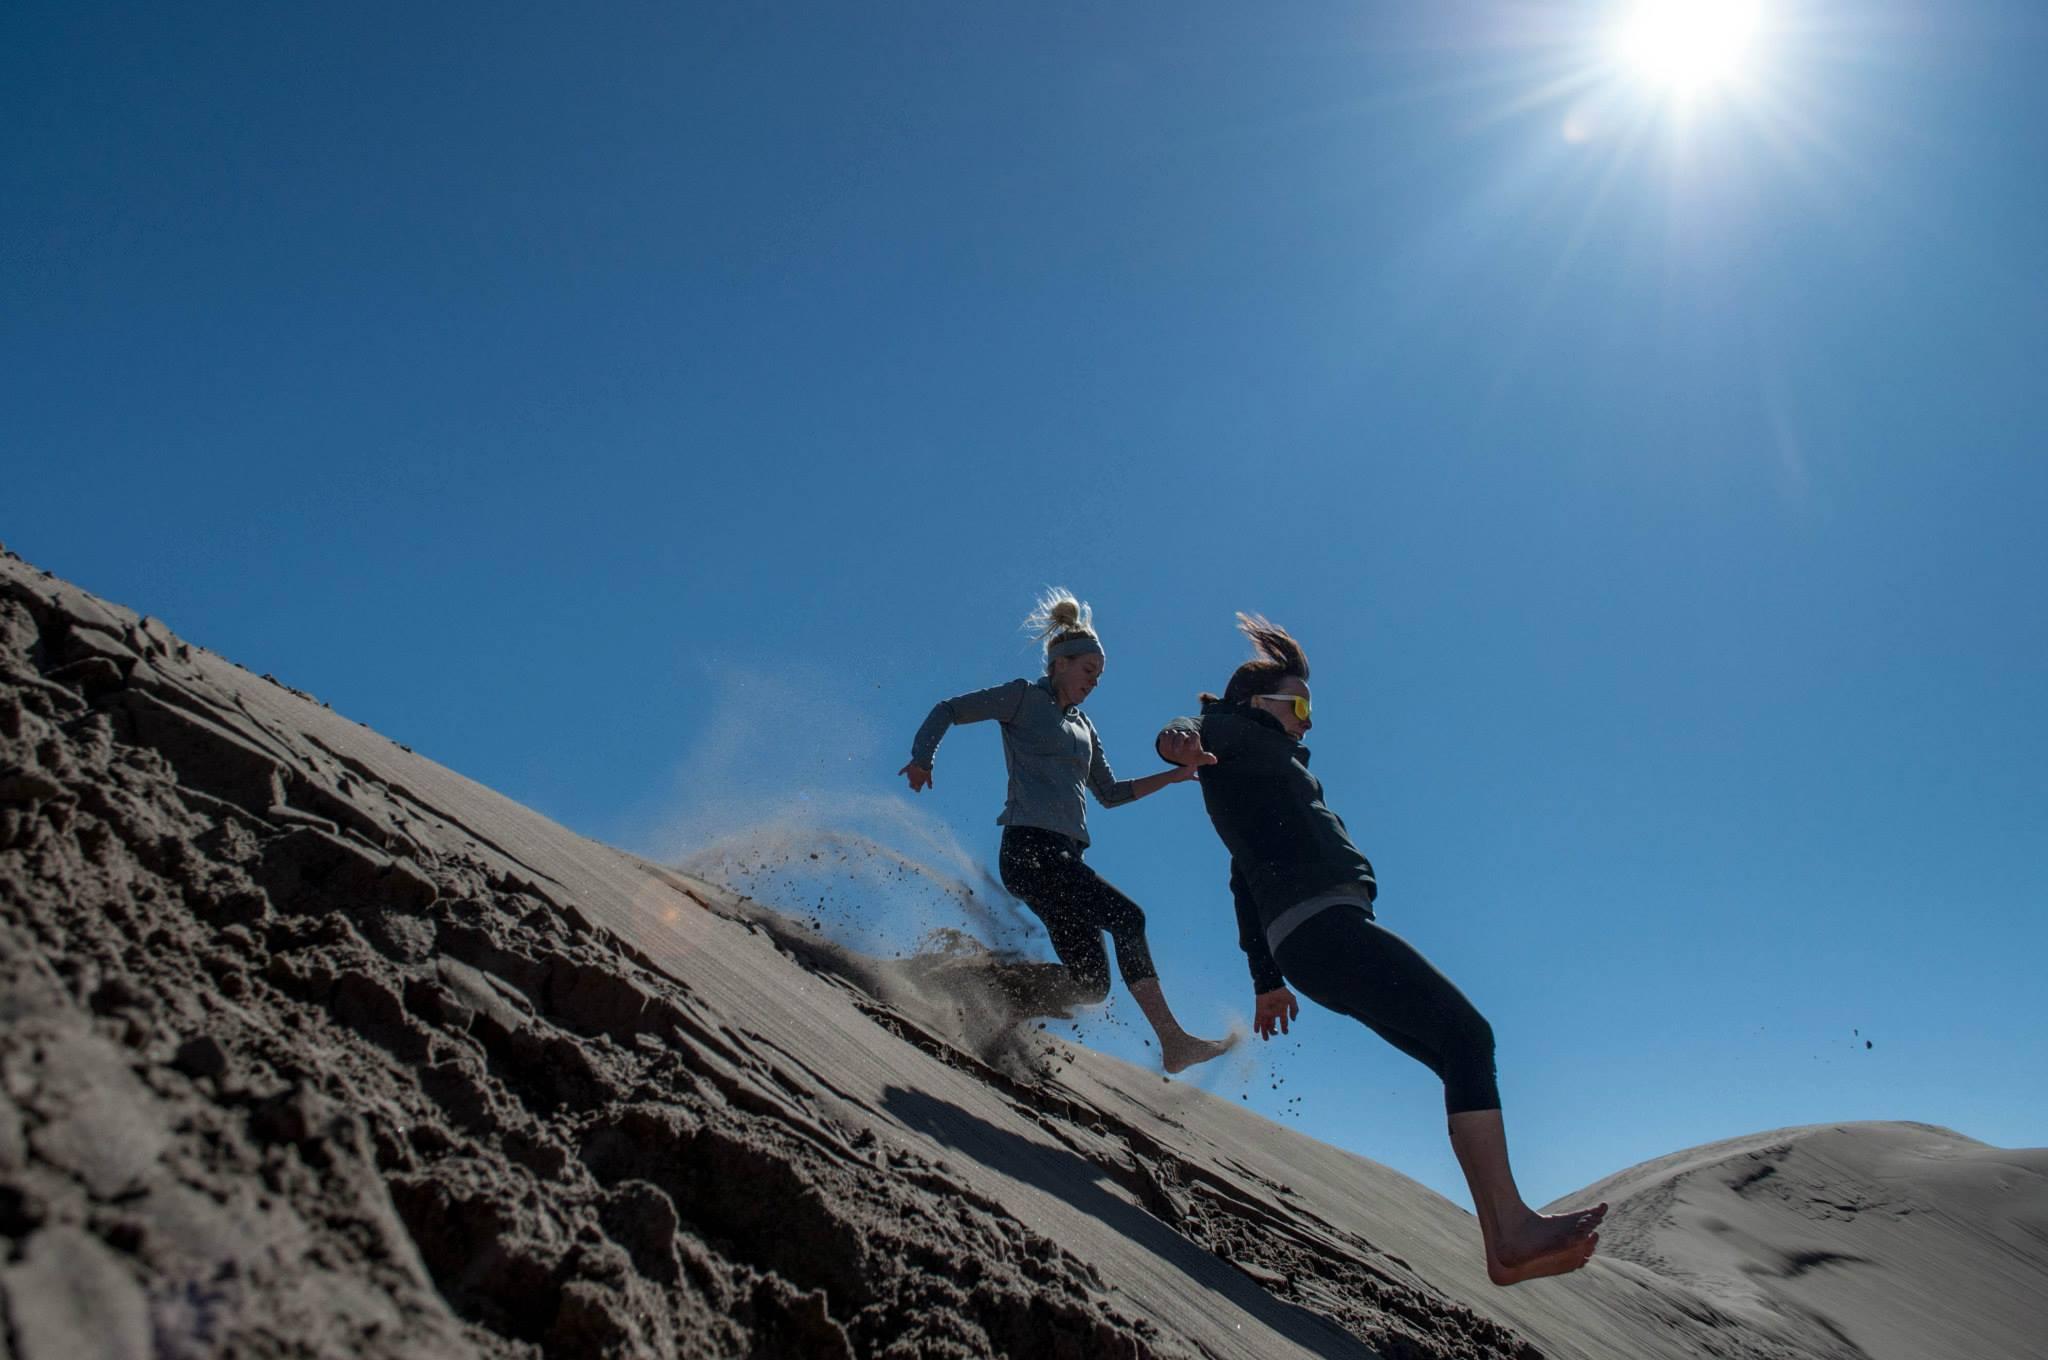 Sarai Snyder Jumping.jpg